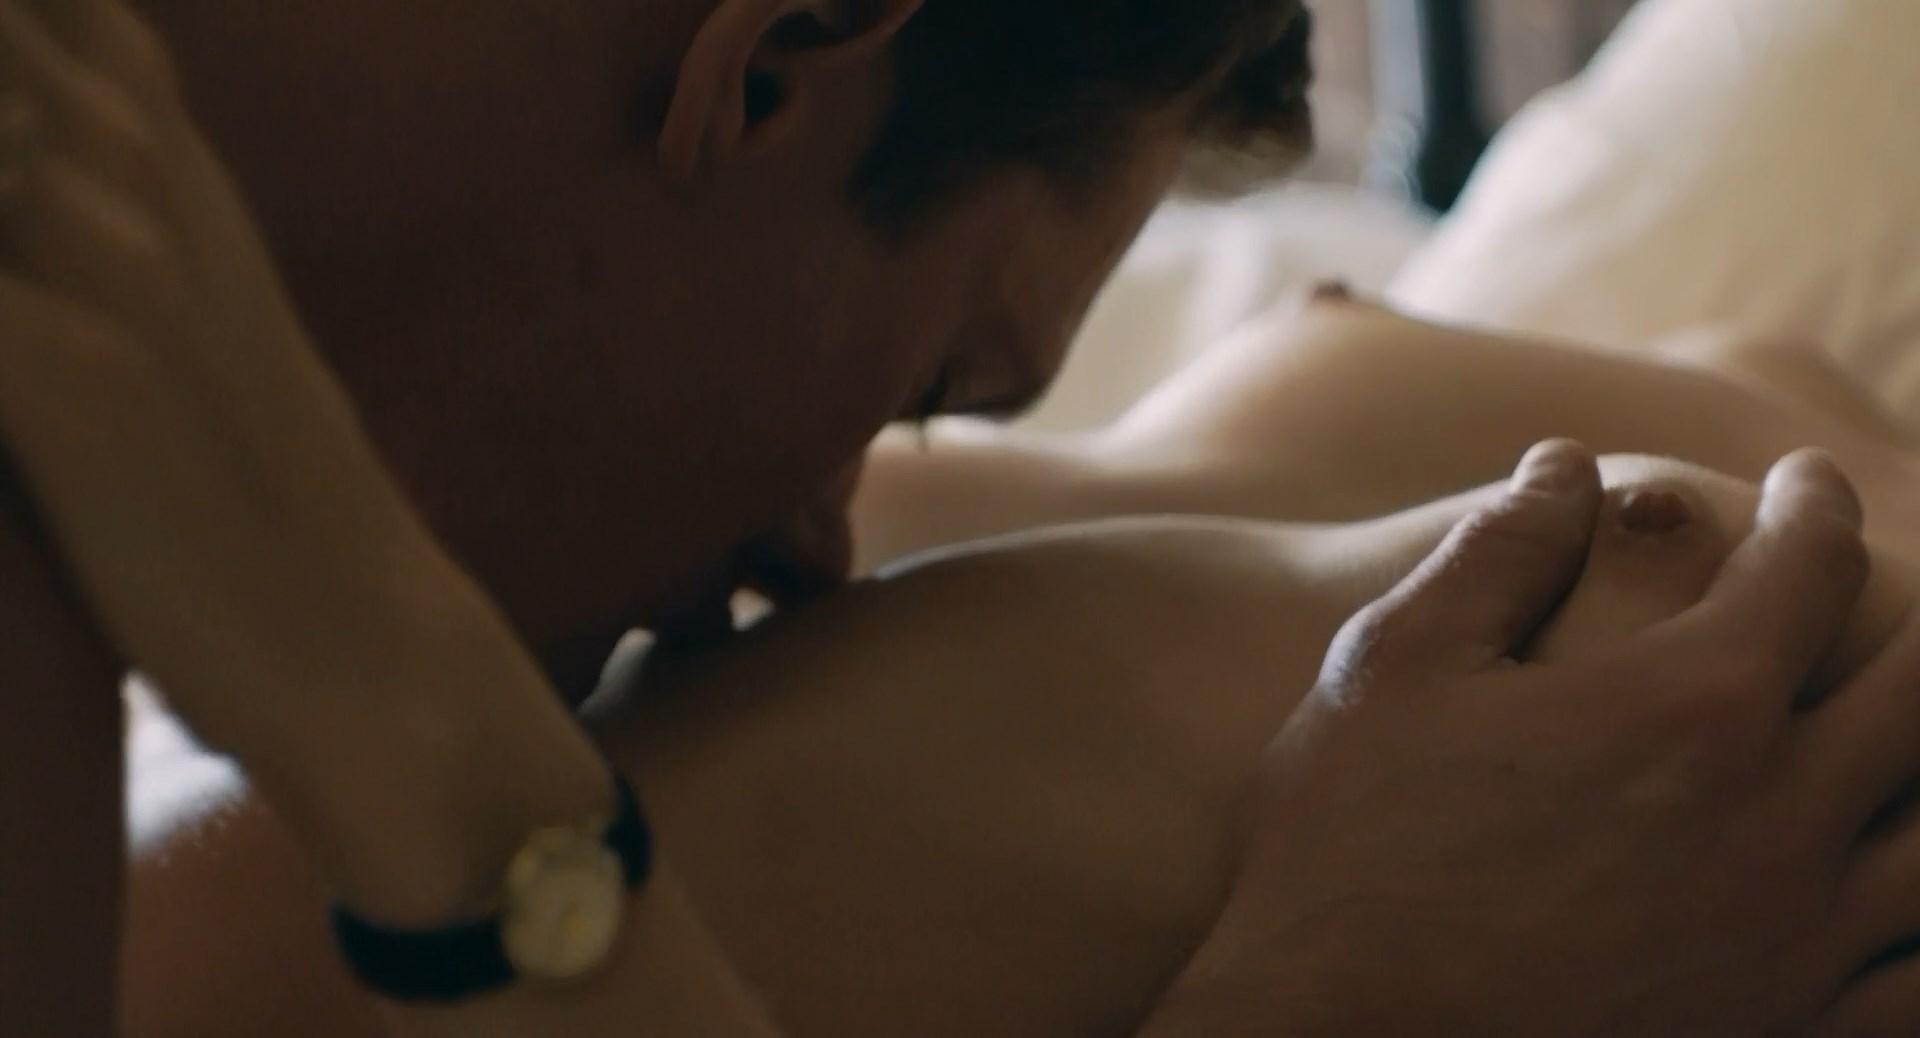 sexy sluty porn star babes